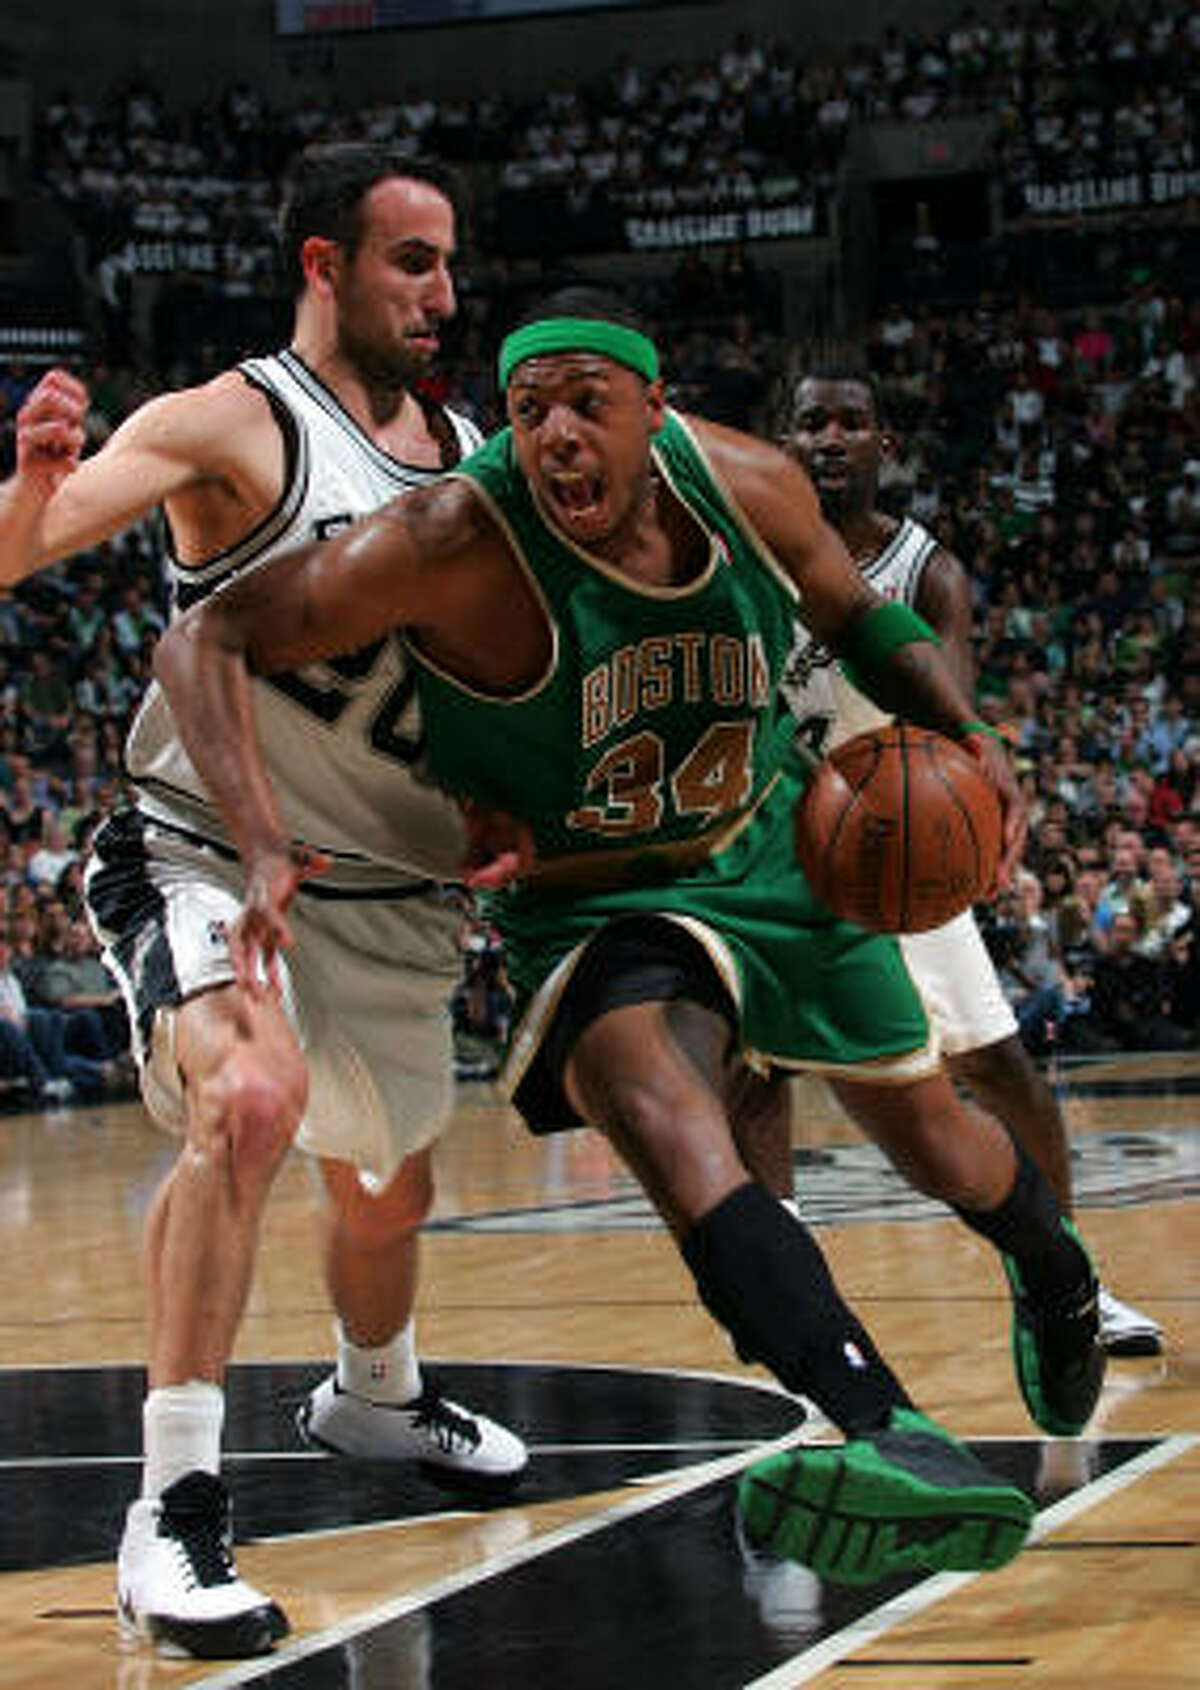 Celtics forward Paul Pierce, who scored 22 points, drives to the basket against Spurs guard Manu Ginobili.